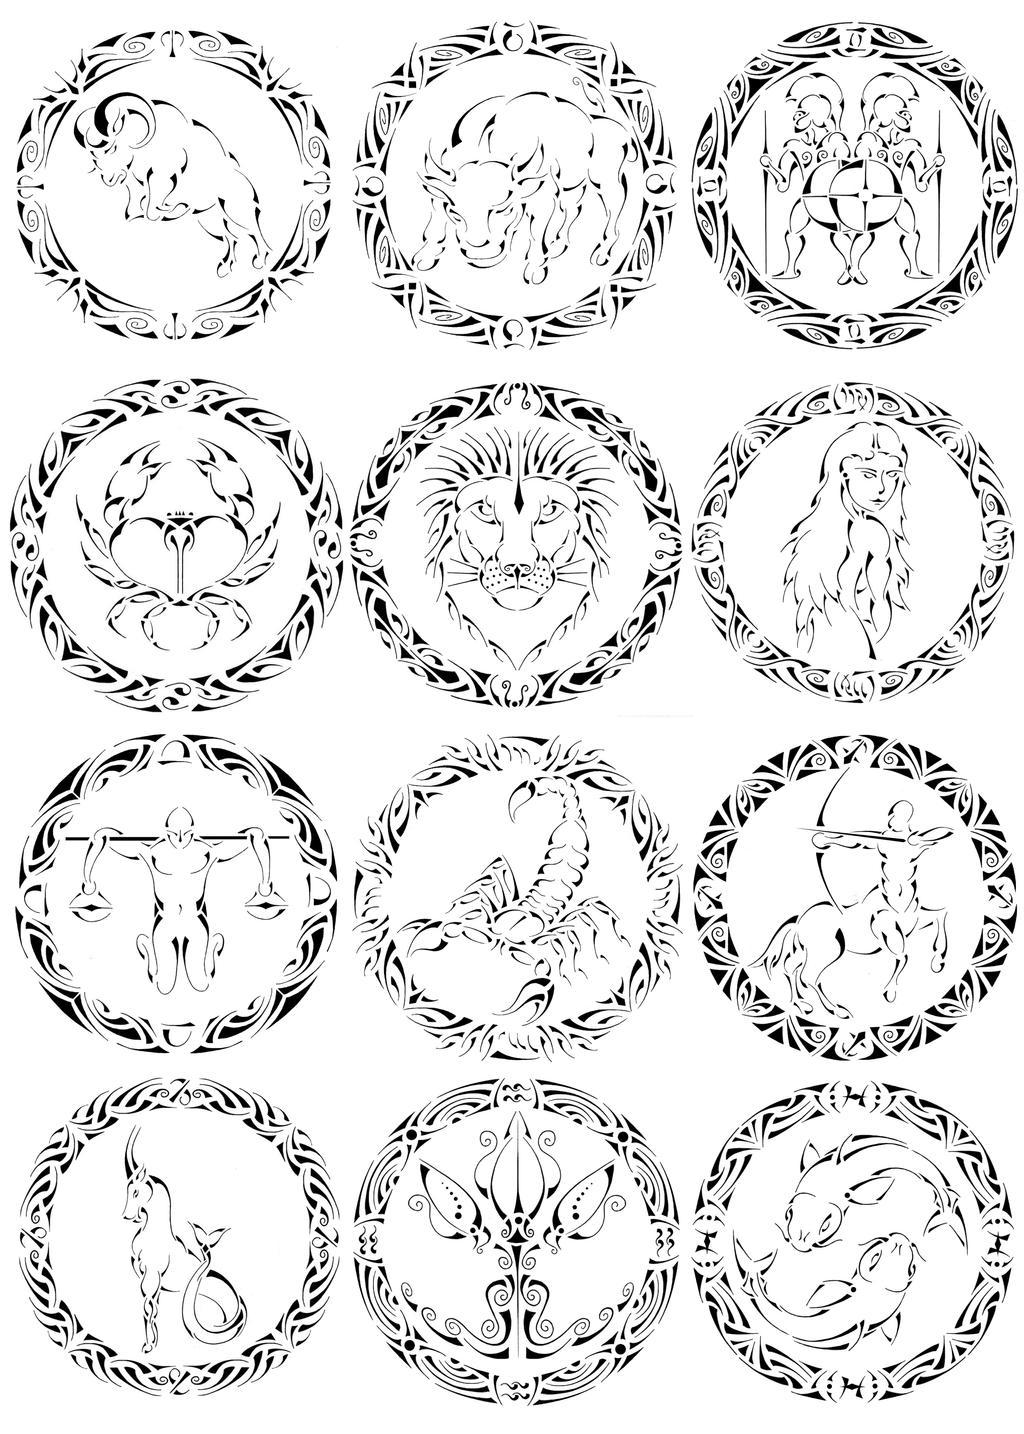 tribal zodiac signs by curvy tribal on deviantart